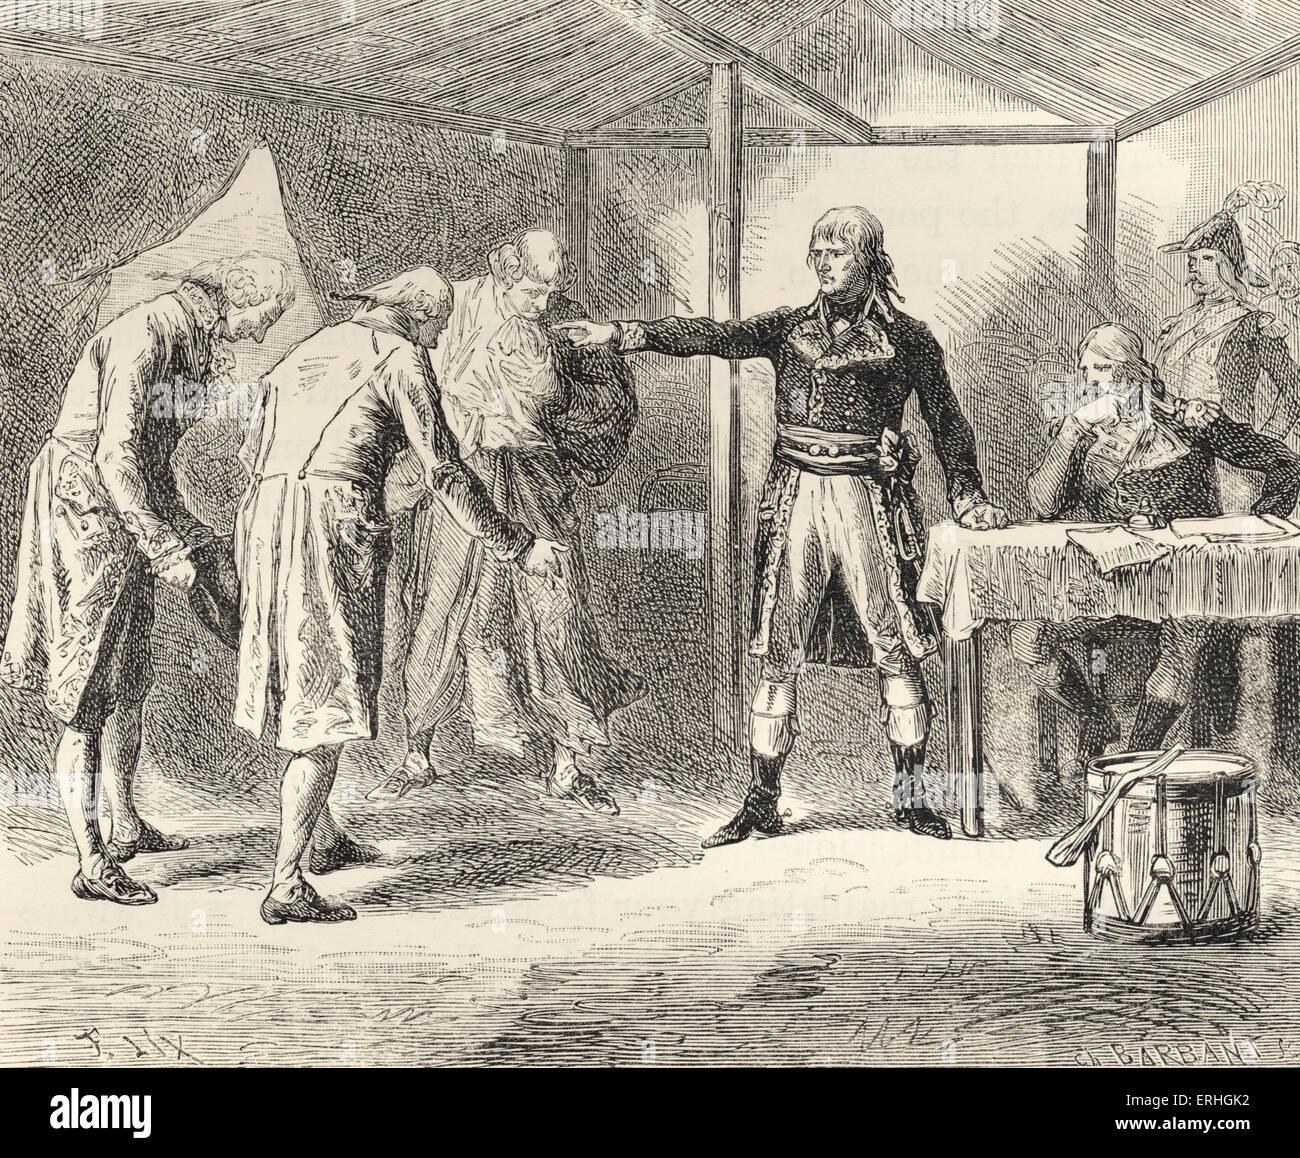 Eines venezianischen Senat Gesandten geschickt, um Napoleon Bonaparte, die Ursache von Venedig als neutraler Staat Stockbild